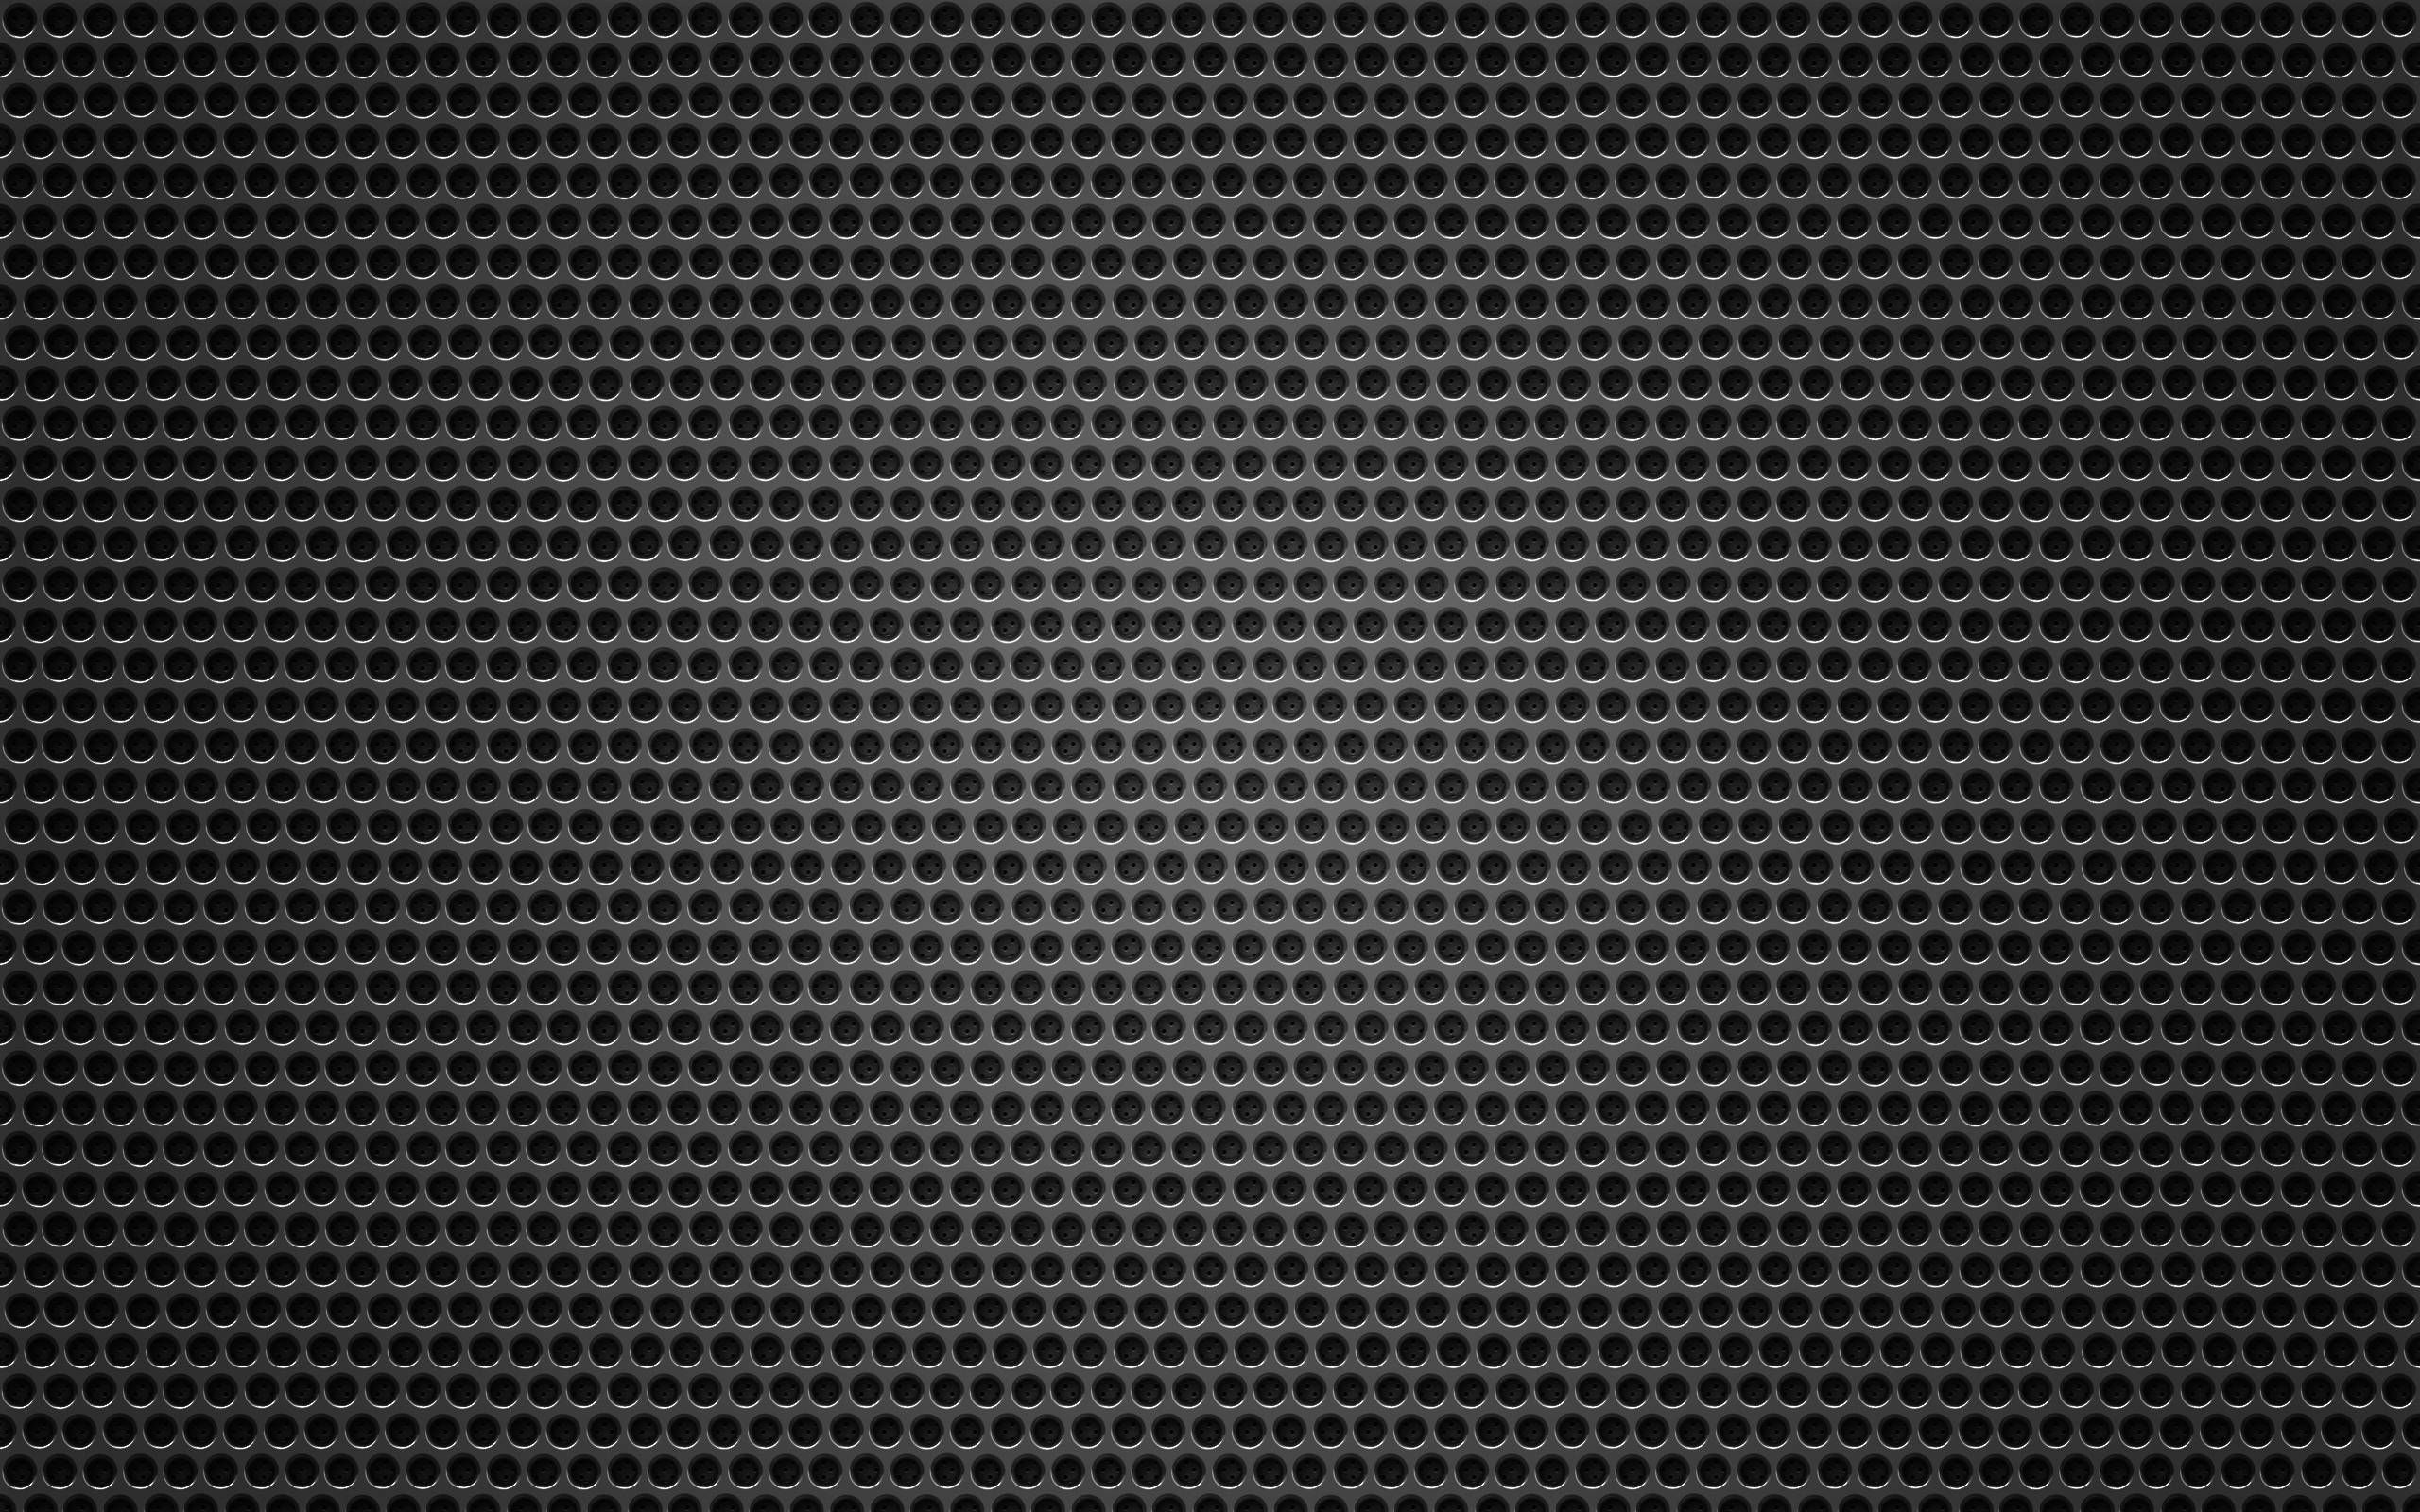 Black Carbon Wallpapers Wallpaper Black textured